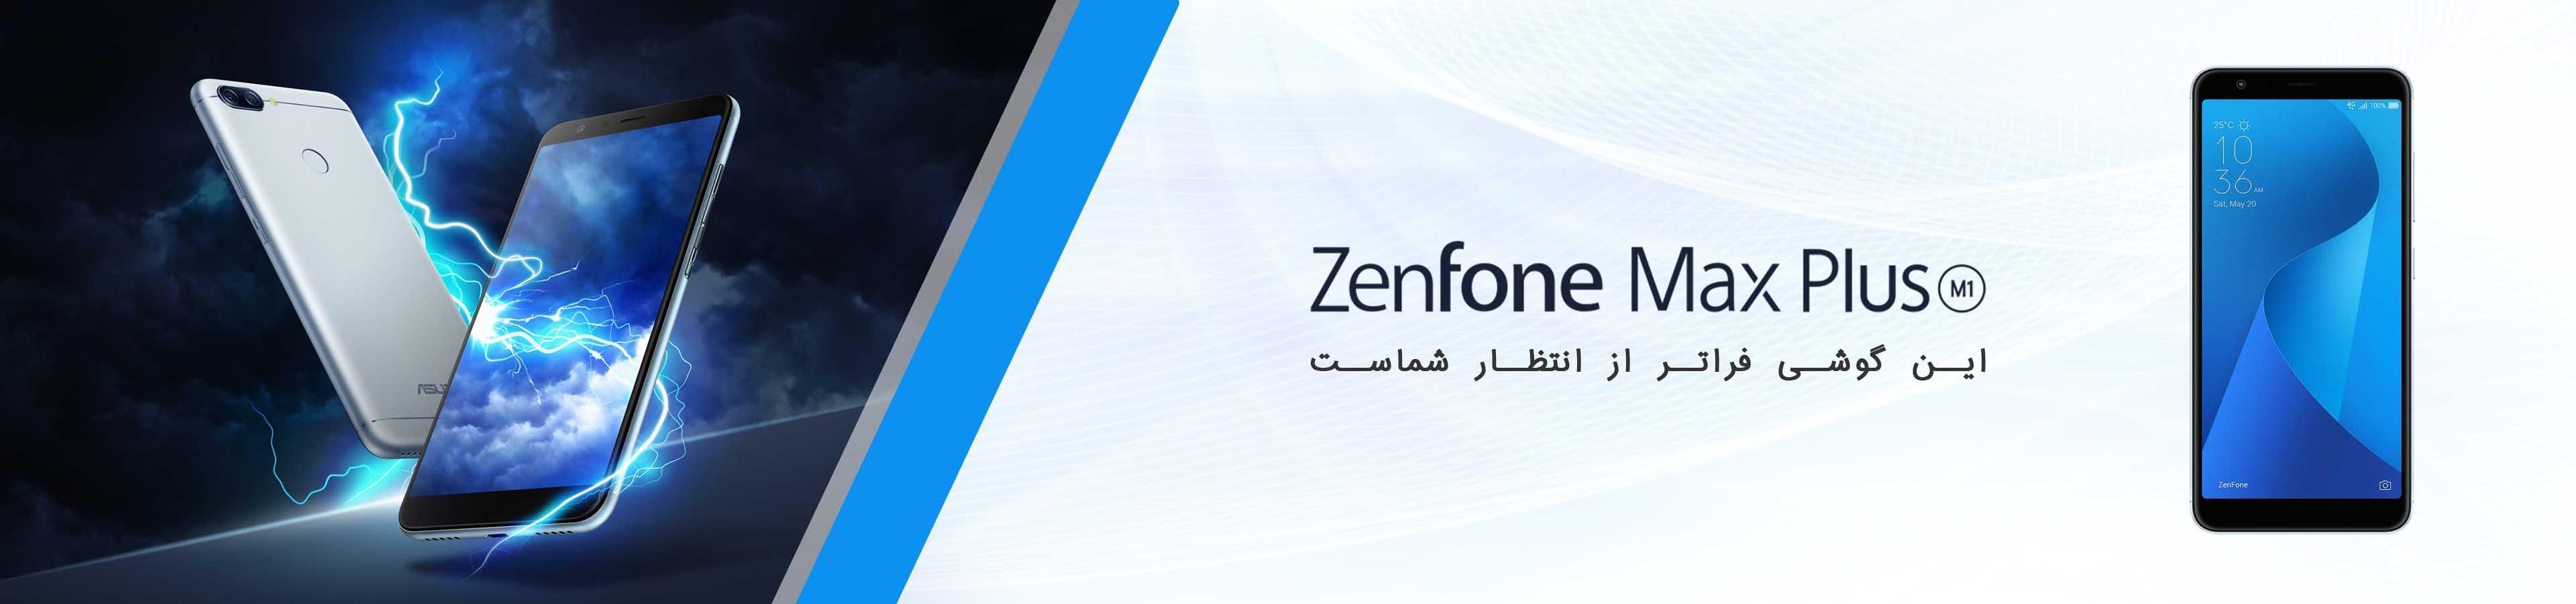 Zenfone-Max-Plus